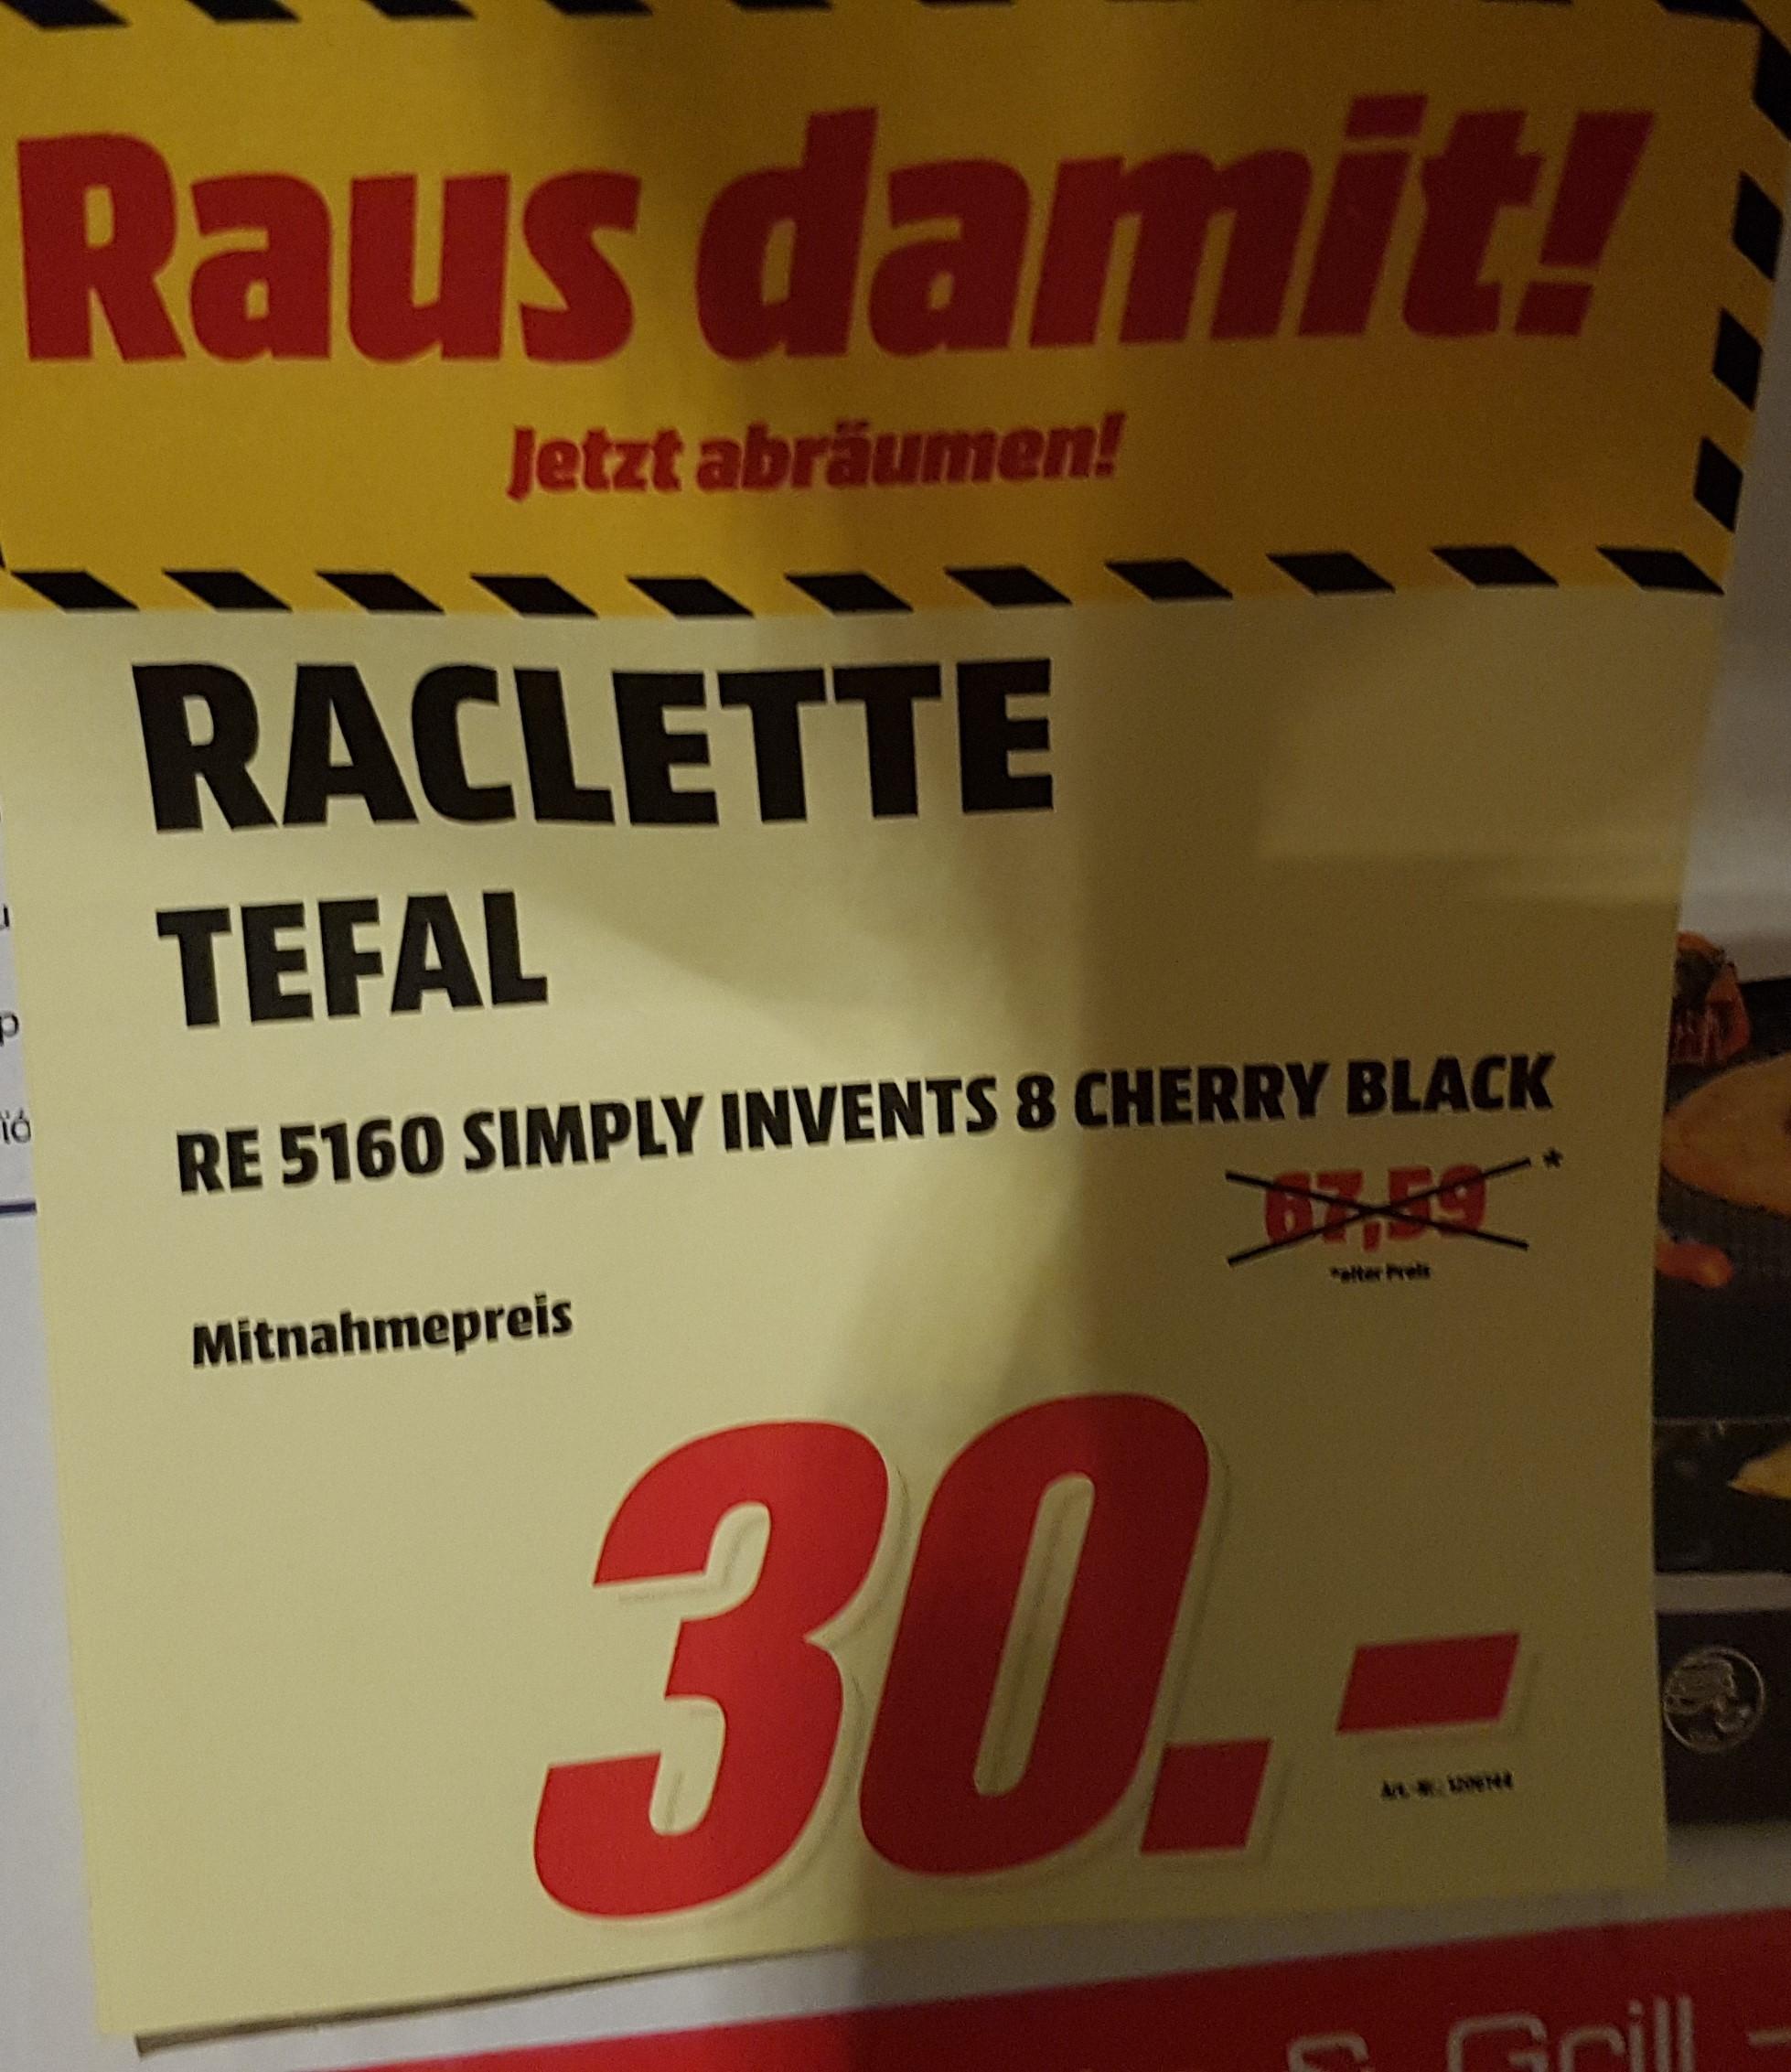 [Schwäbisch Hall] Raclette Tefal RE 5160 Simply Invents 8 lokal im Media Markt